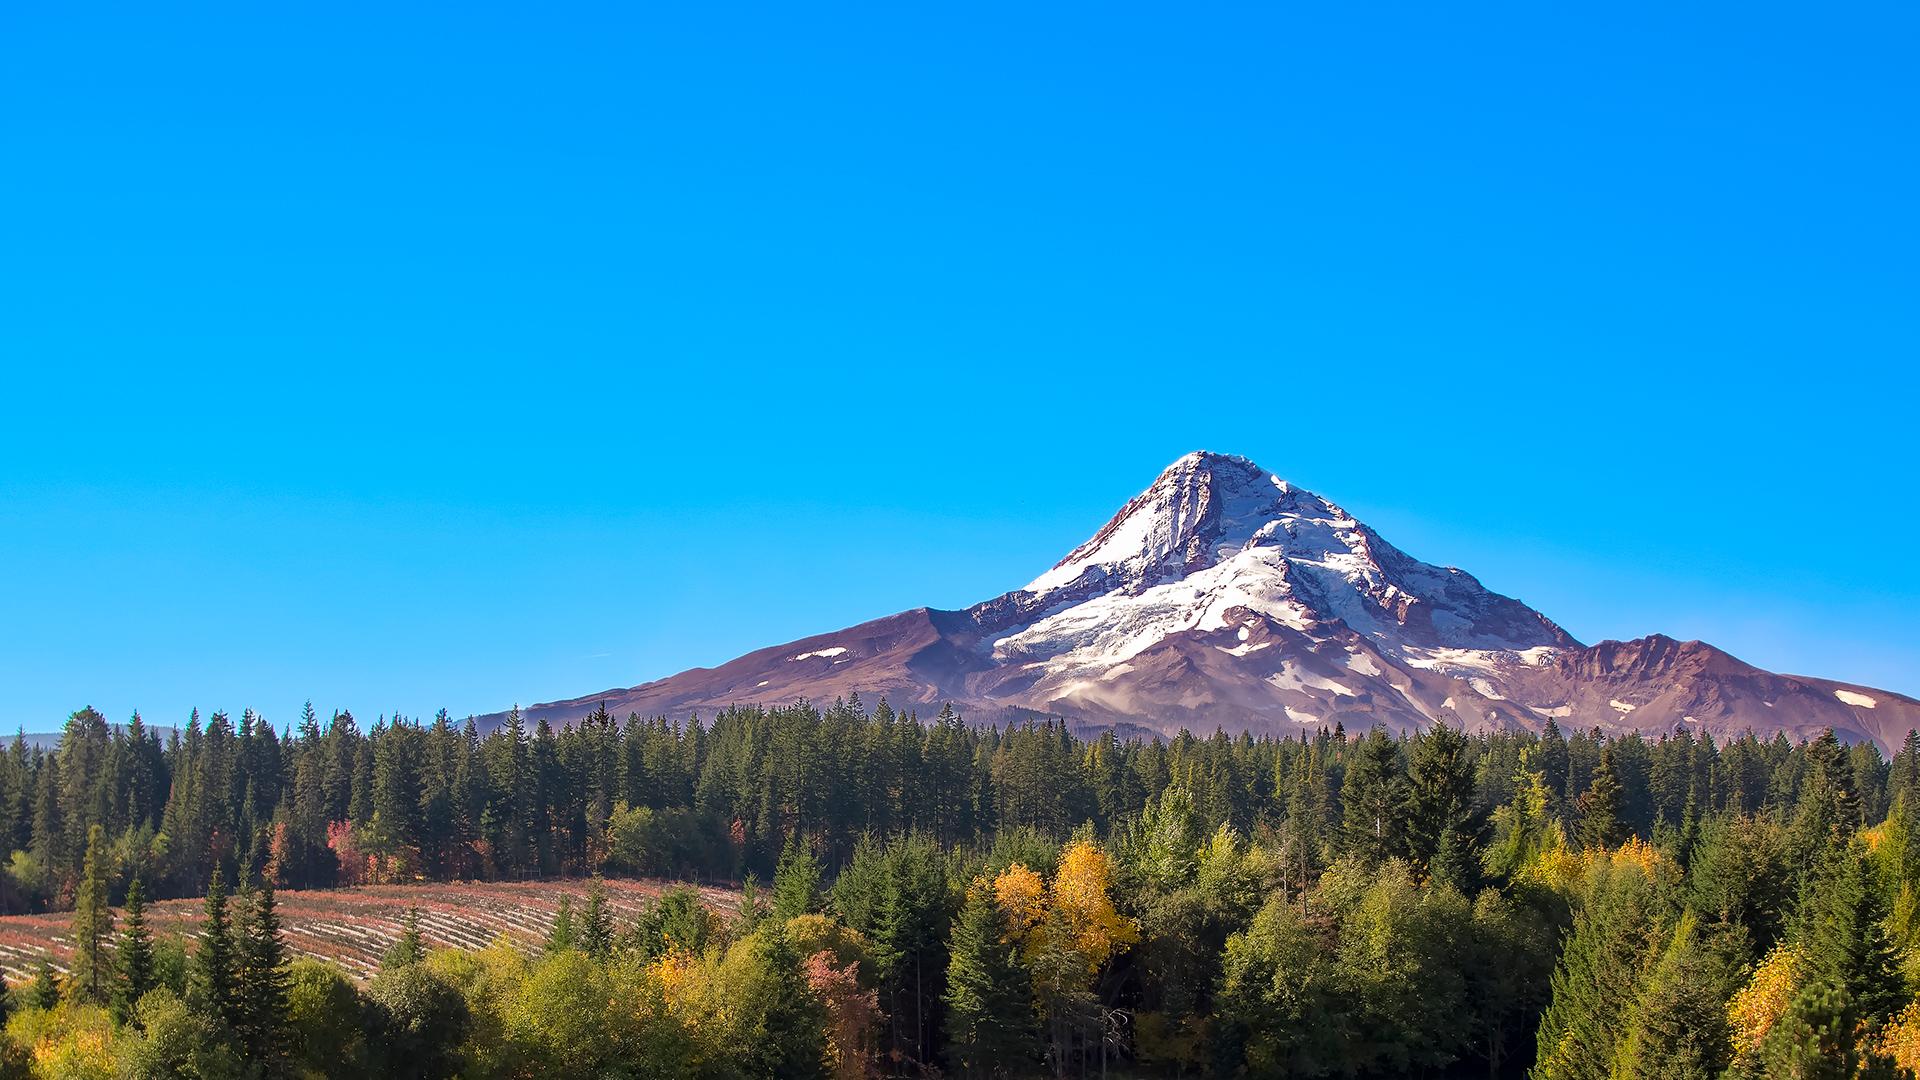 Mt Hood in Autumn